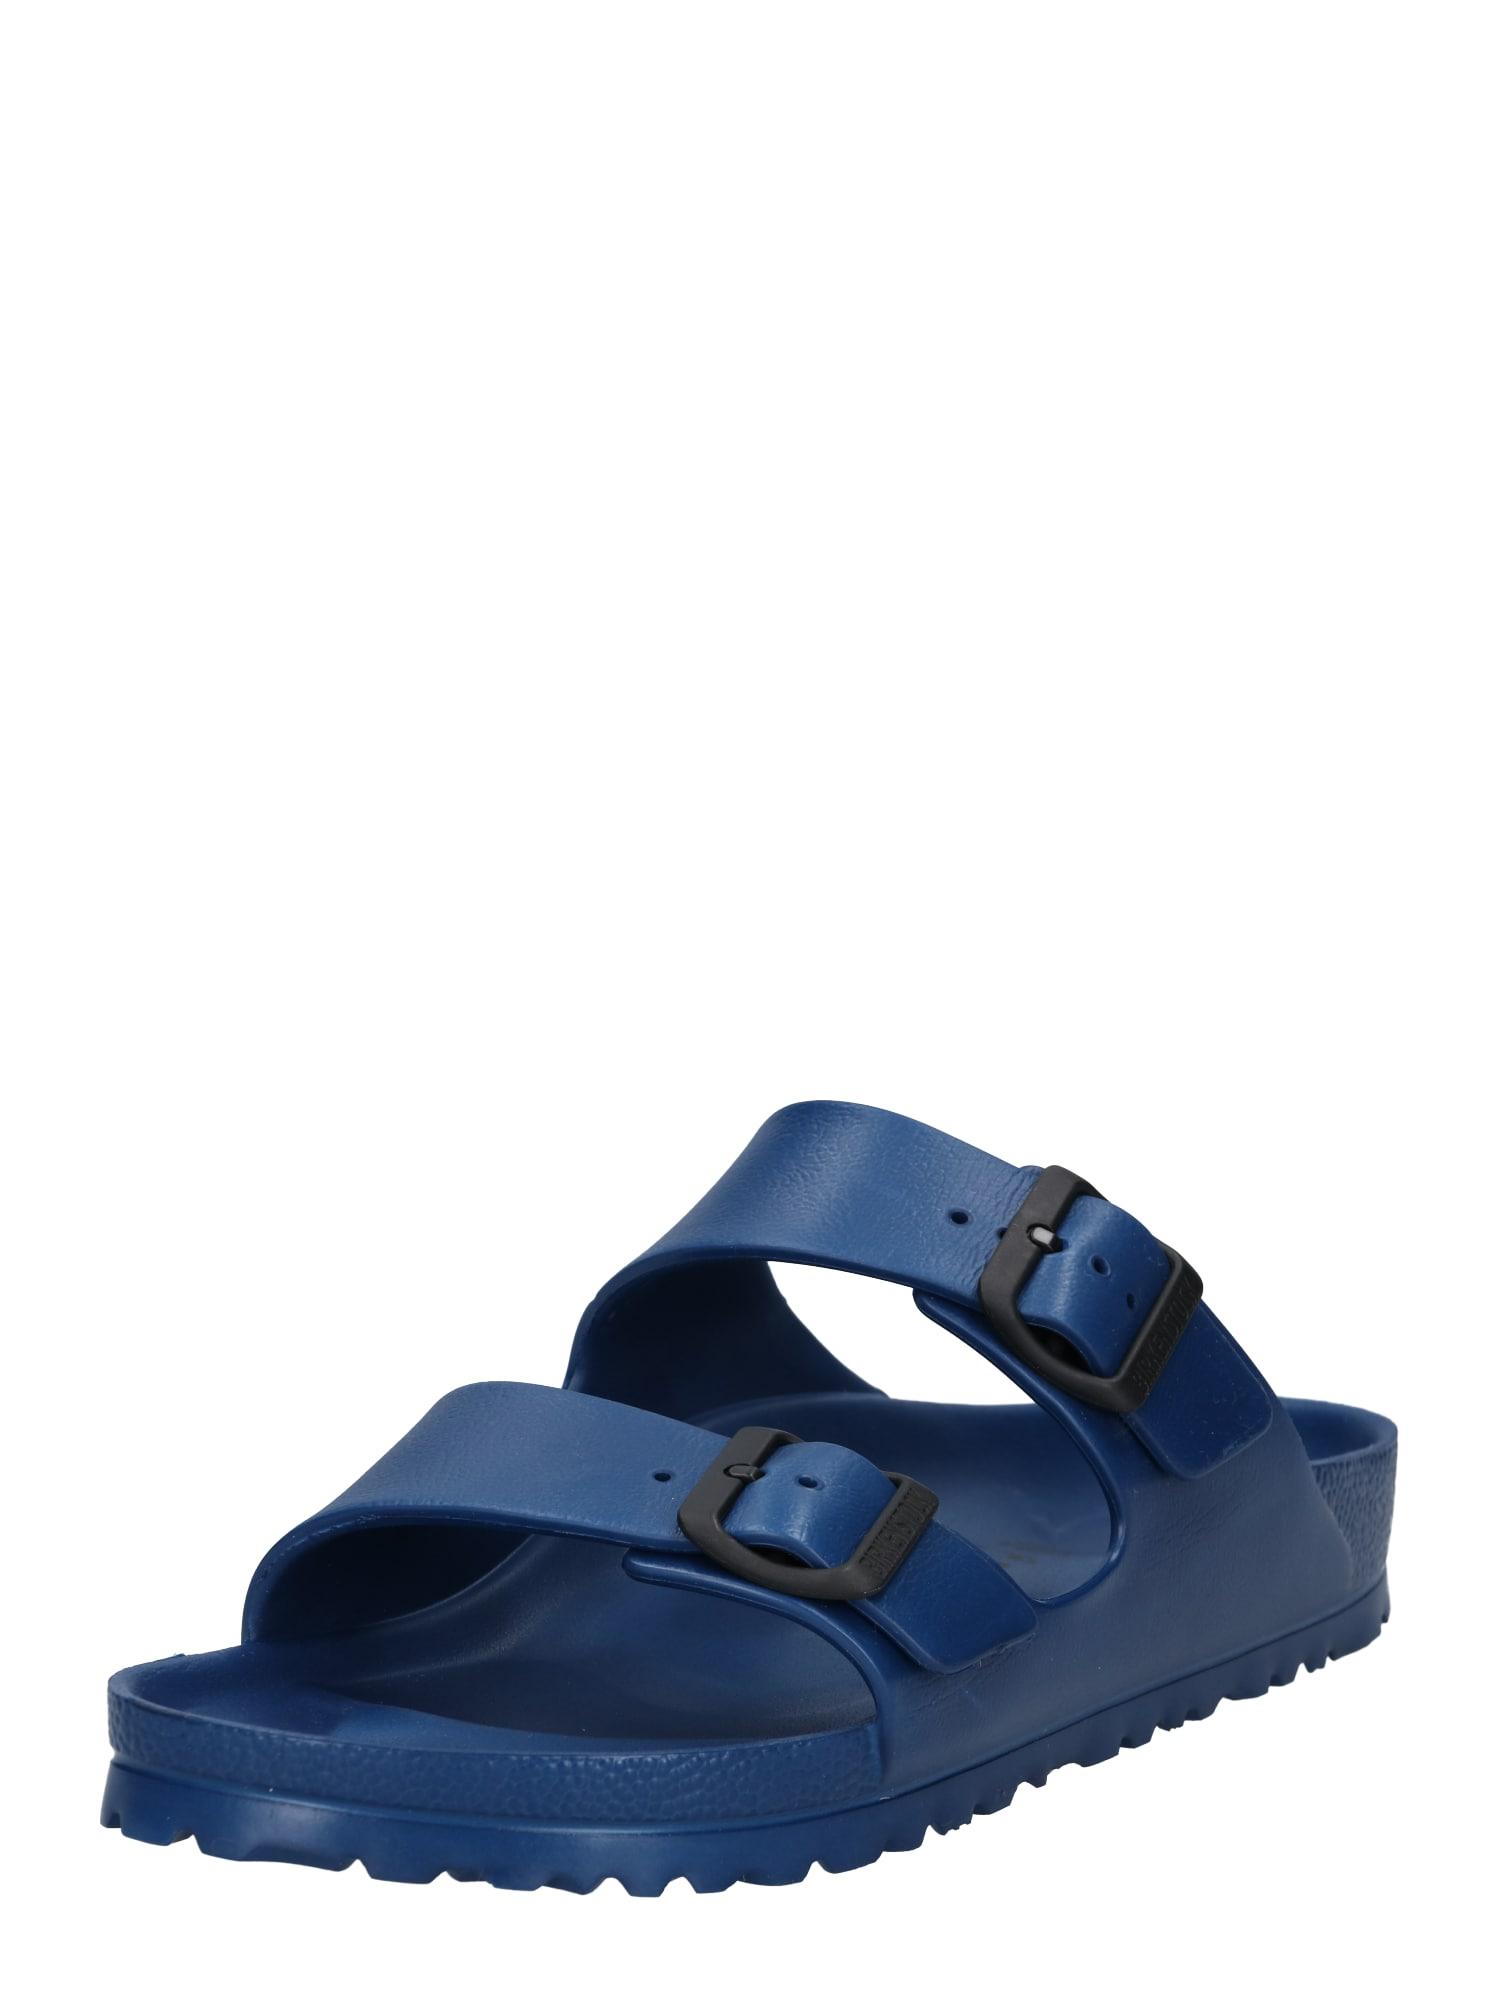 Pantofle ARIZONA EVA námořnická modř BIRKENSTOCK